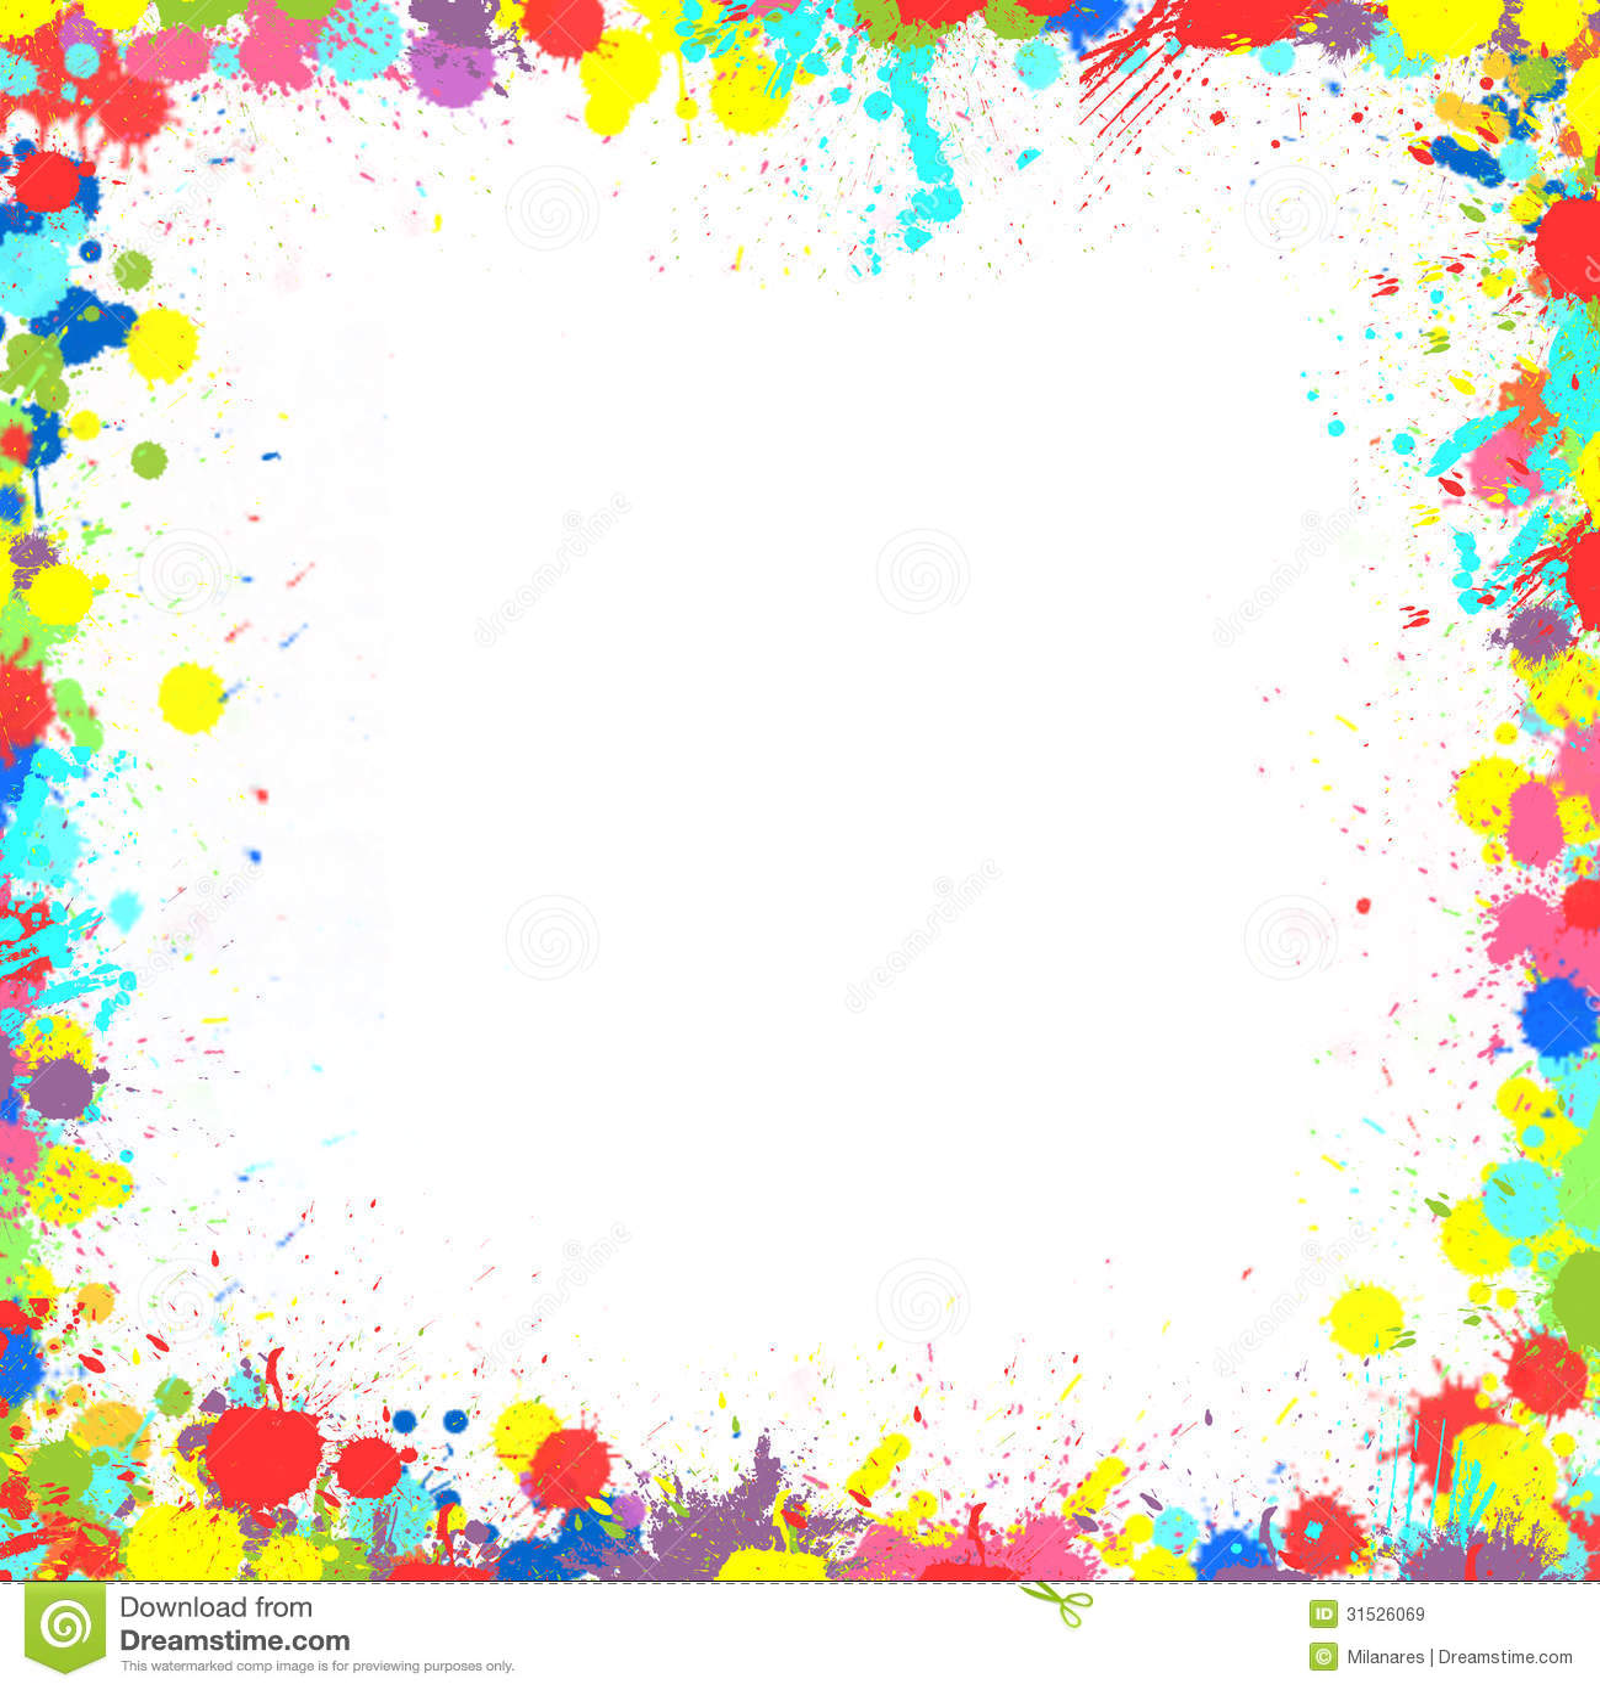 Colorful Inky Splash Frame Border Stock Illustration